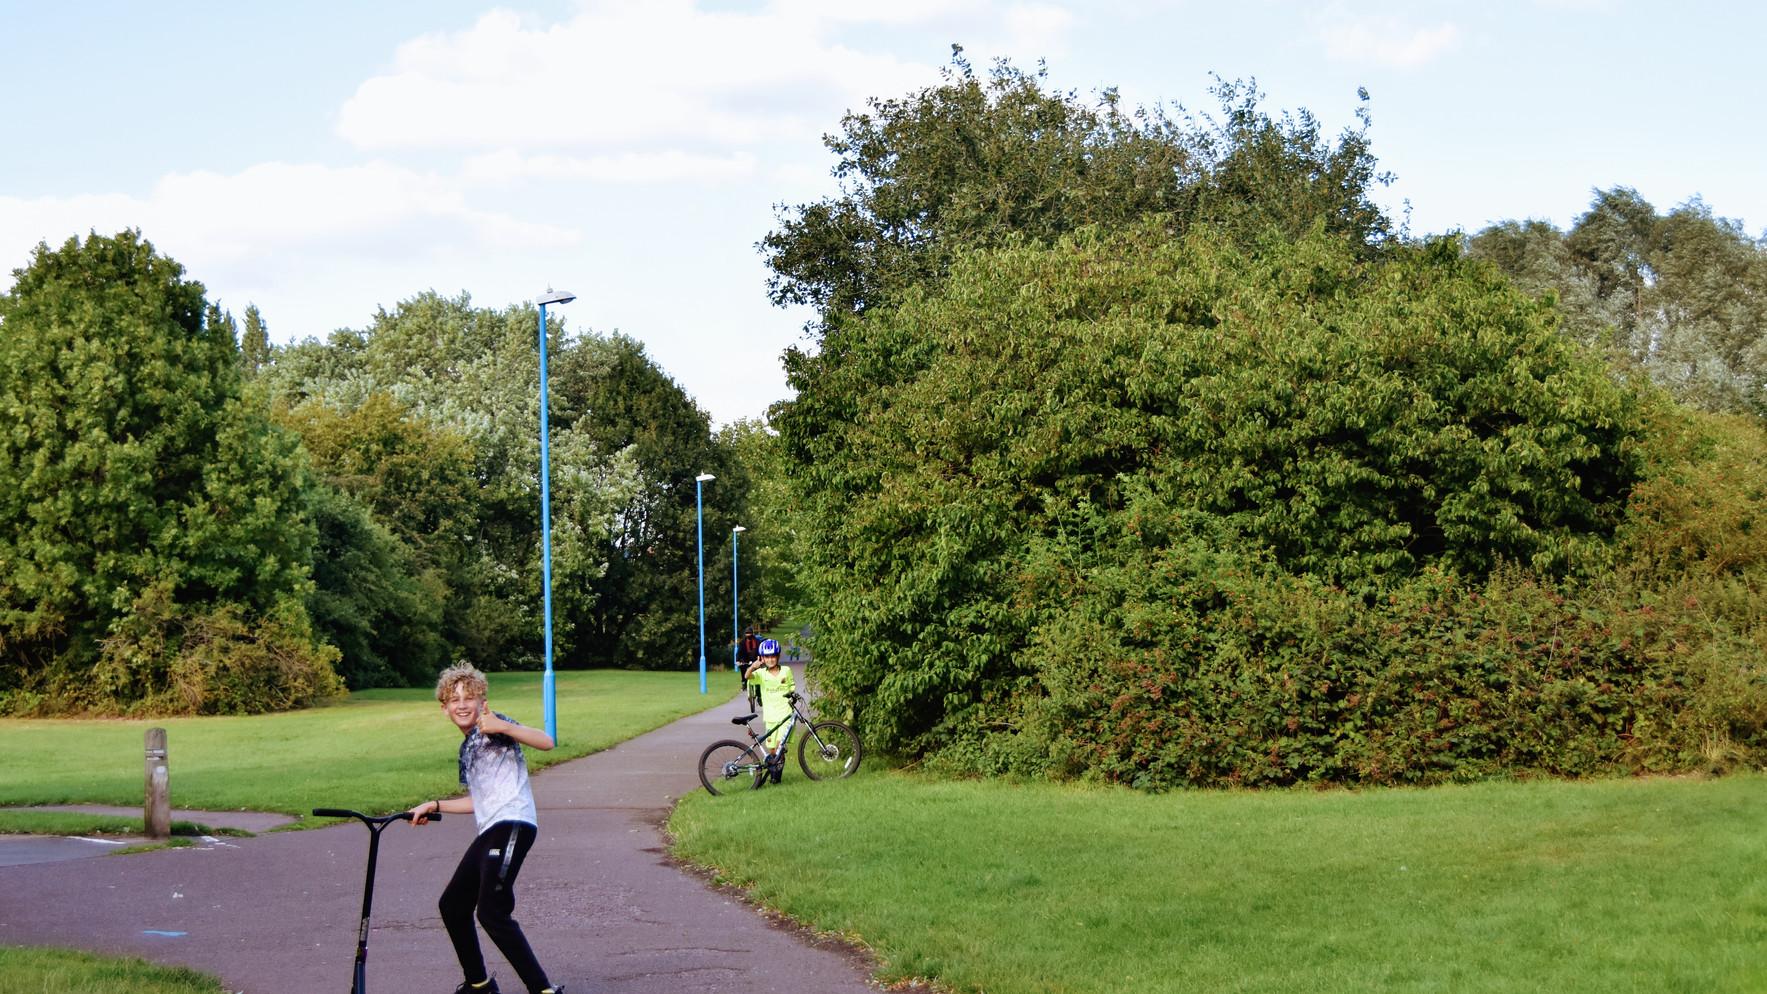 Longford Park, Coventry